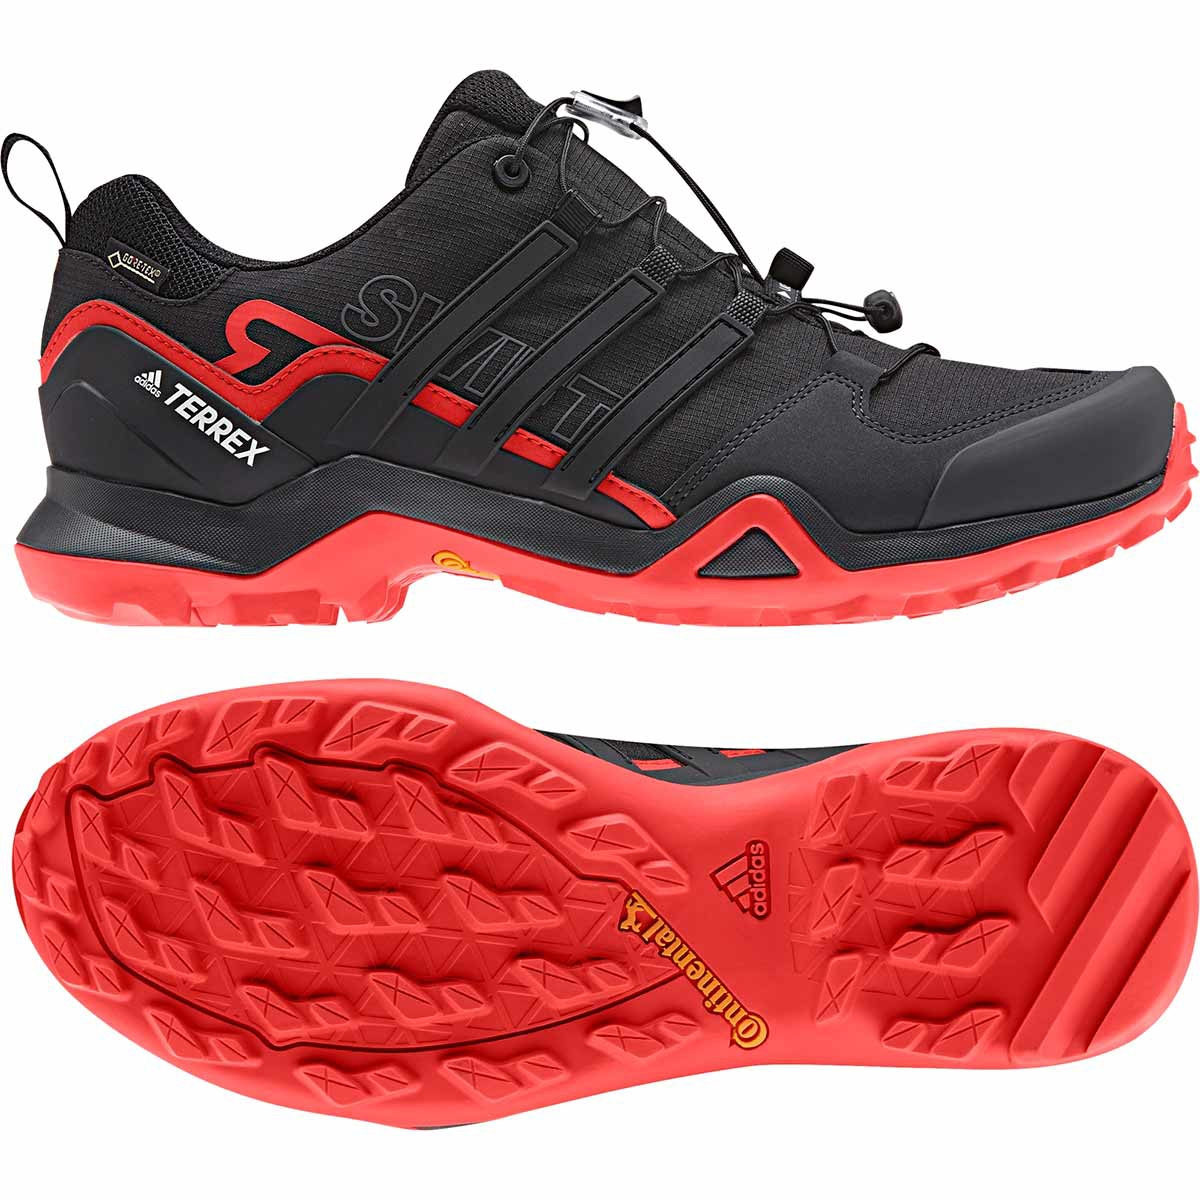 Terrex Adidas Randonnée Gtx Hrr6bwqnu Swift Chaussures Red Black R2 ErXzqHwr